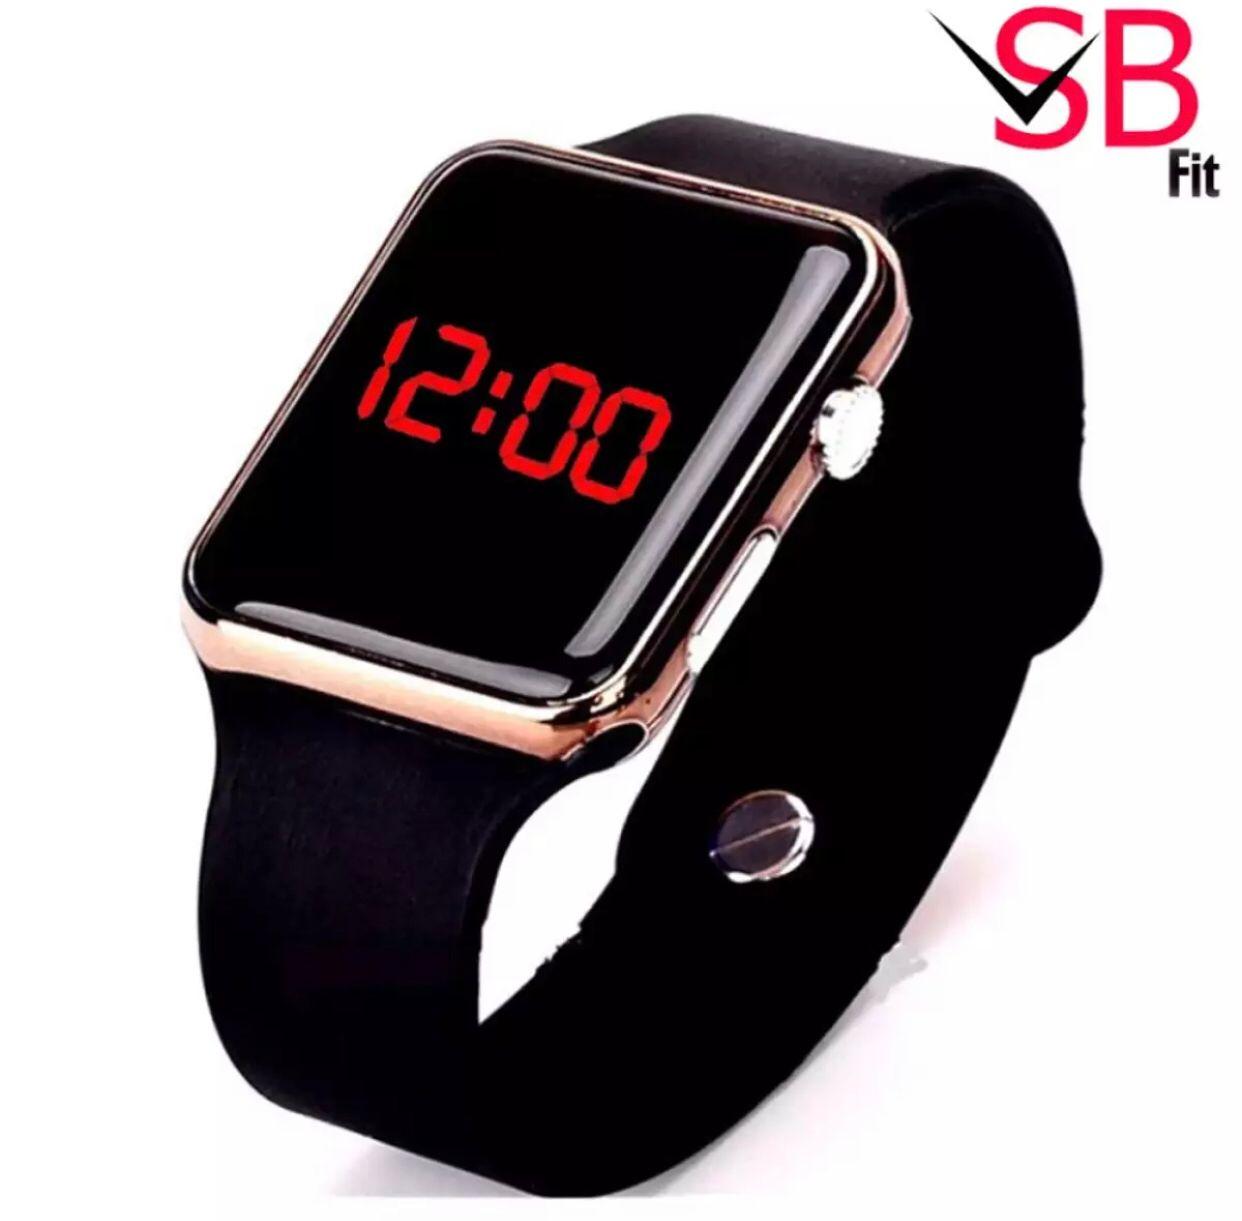 Stylish Luxury Digital Watch For Girls / Women -  Led Smart Ladies Watches For Girls